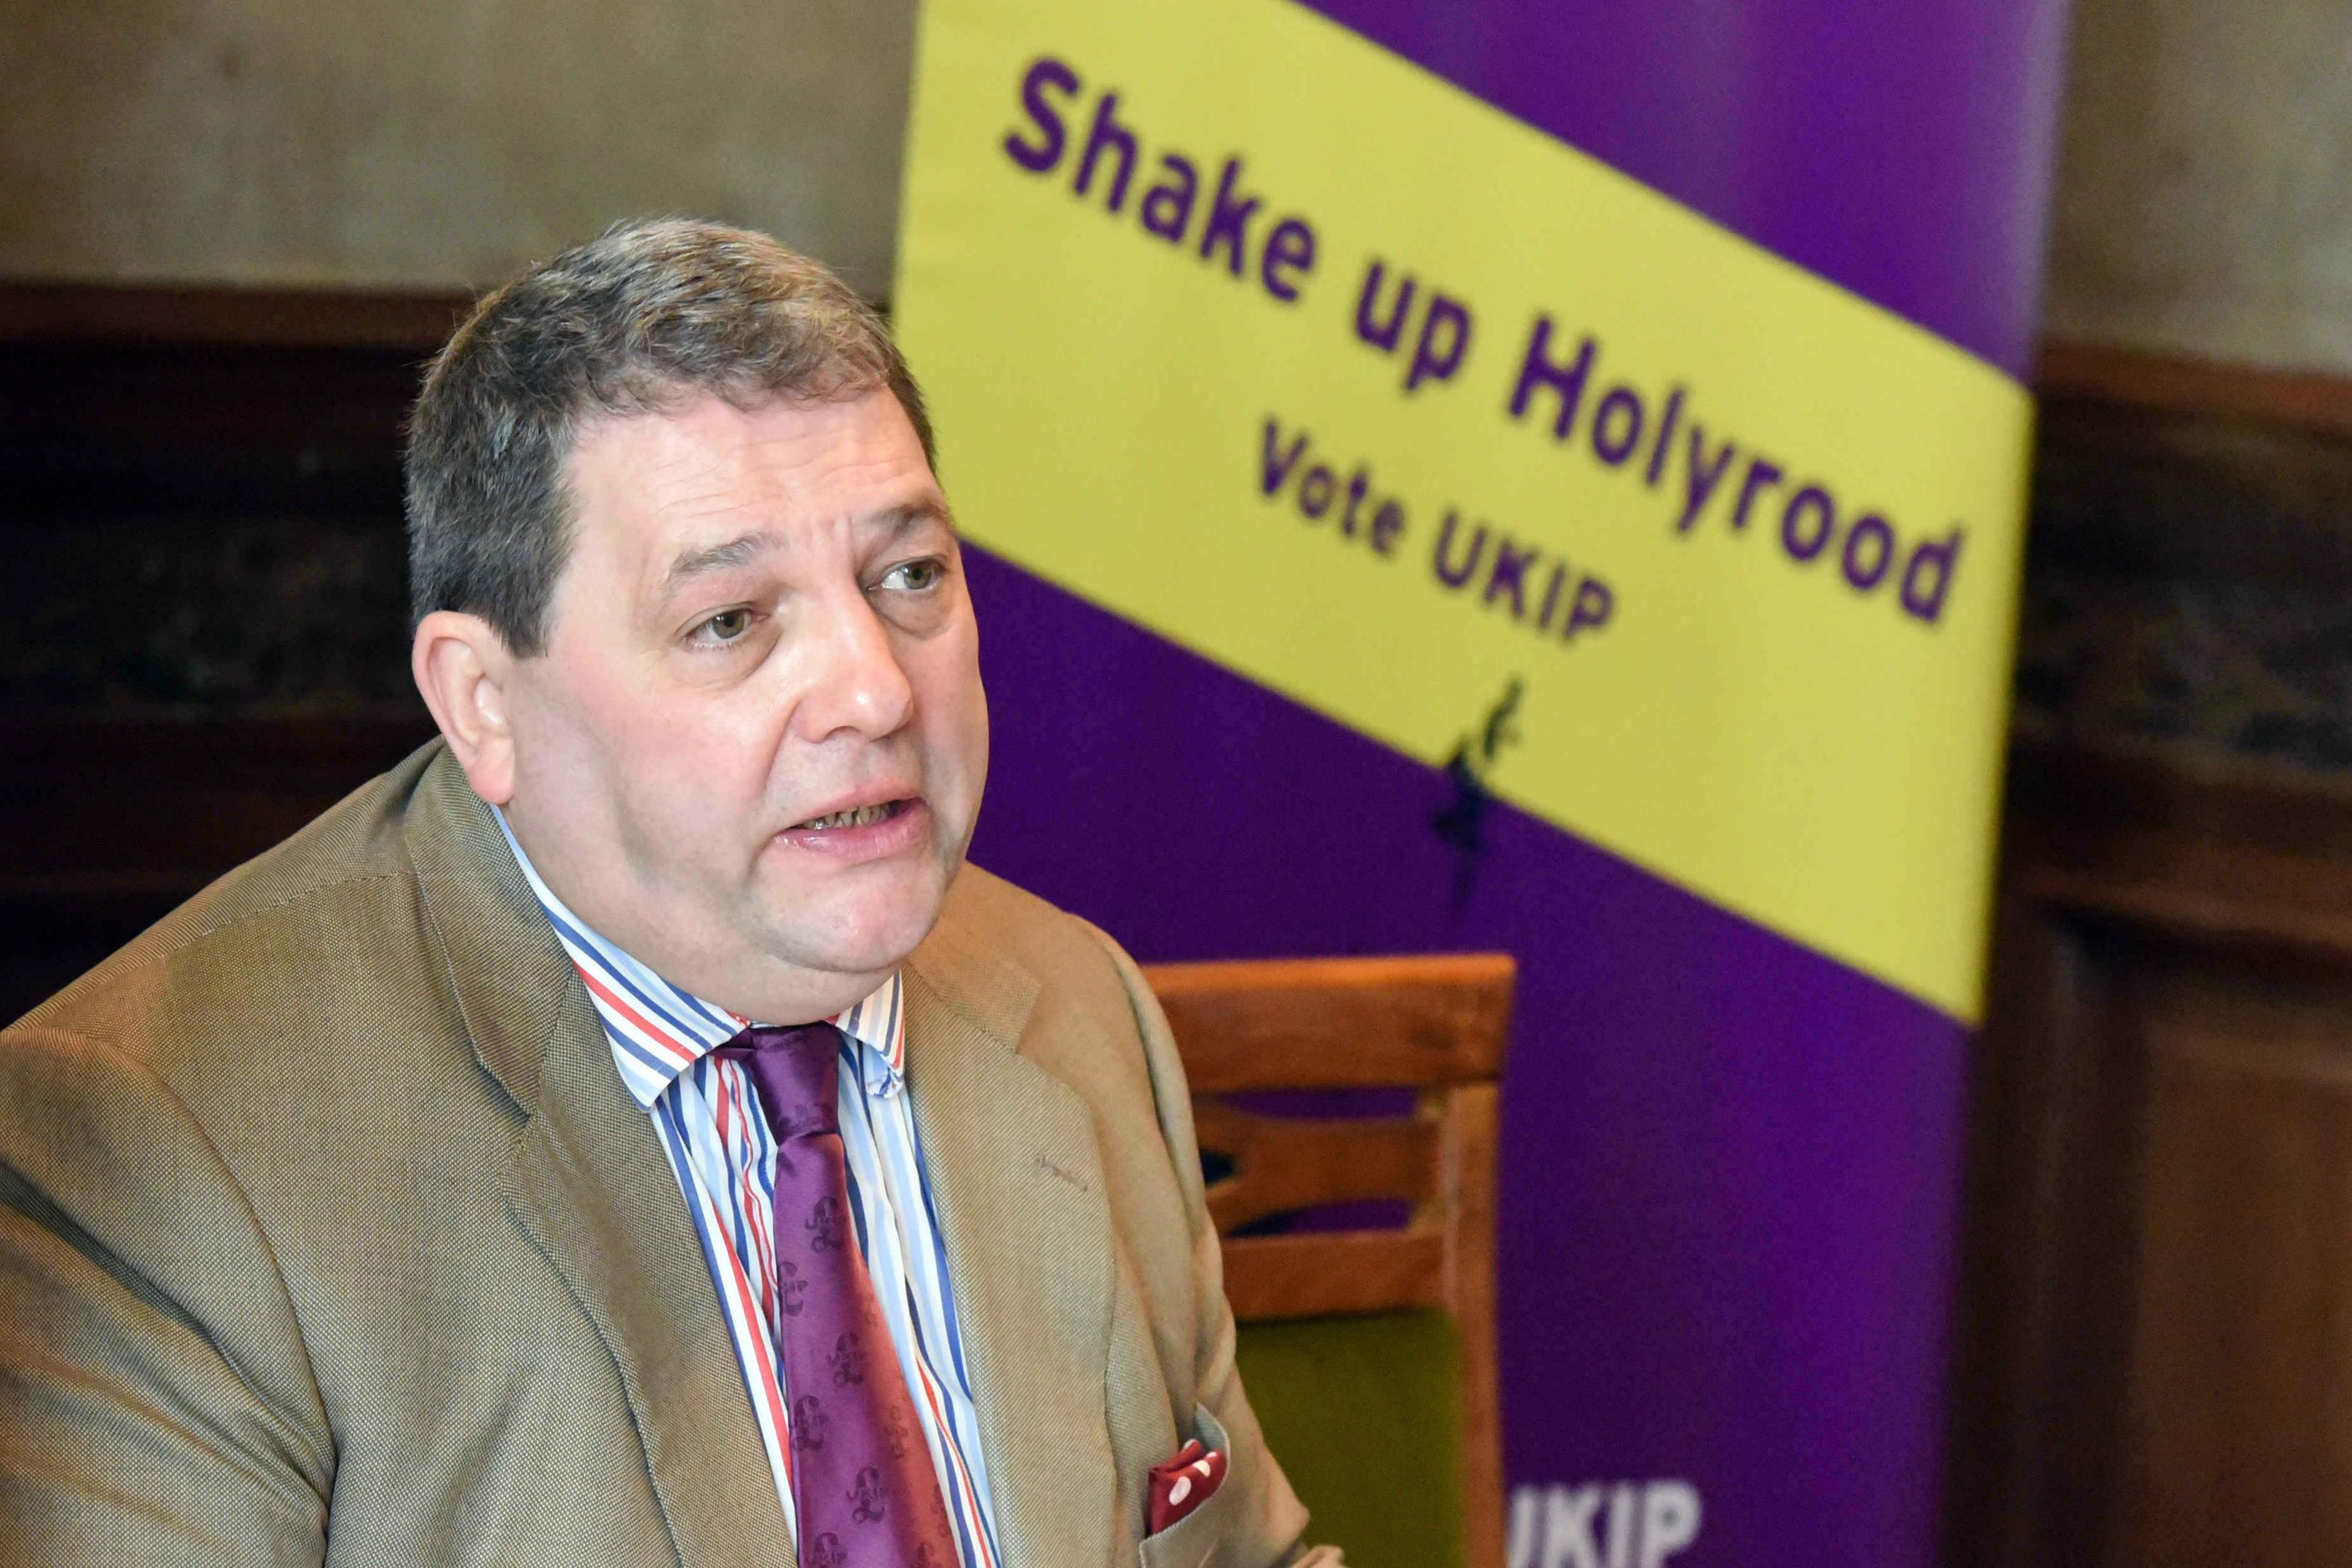 Ukip MEP David Coburn.